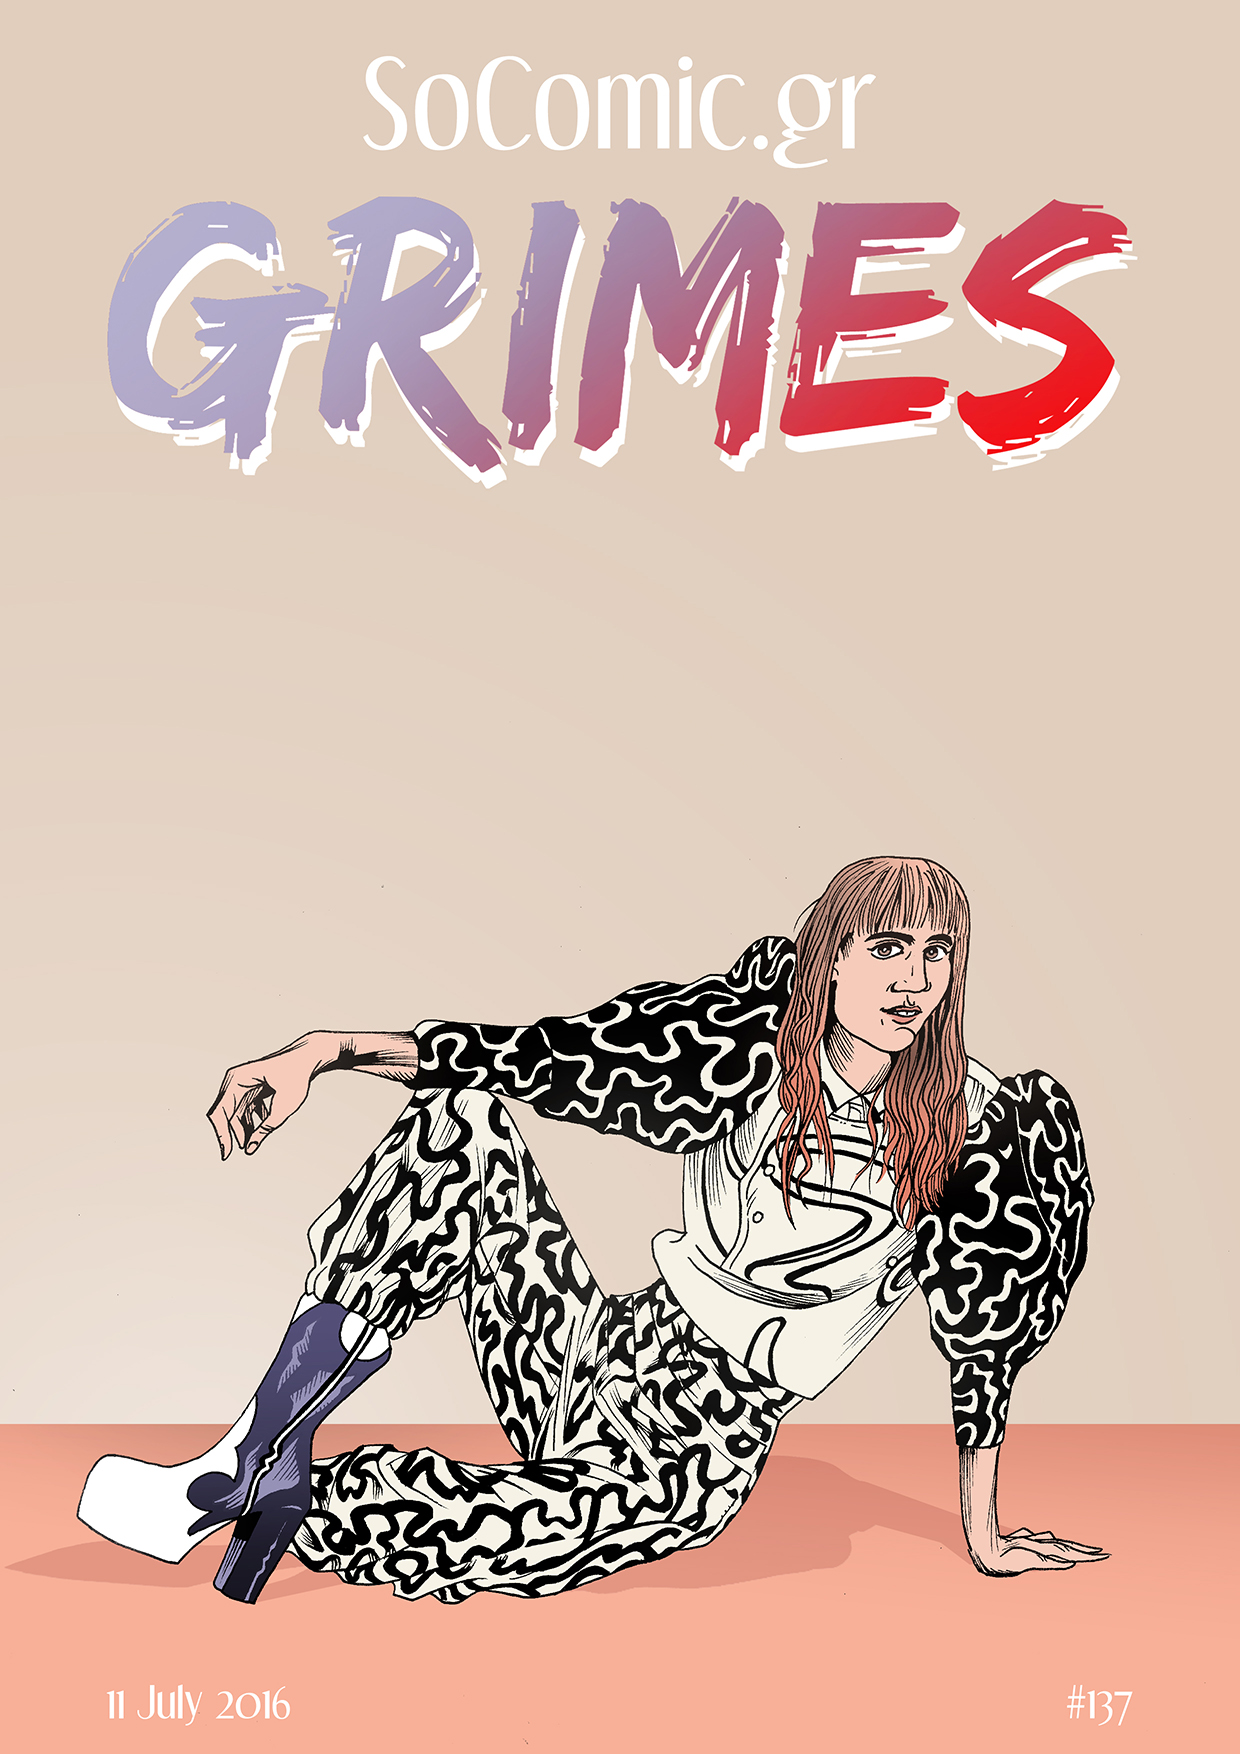 Grimes SoComic by Con Chrisoulis_sm